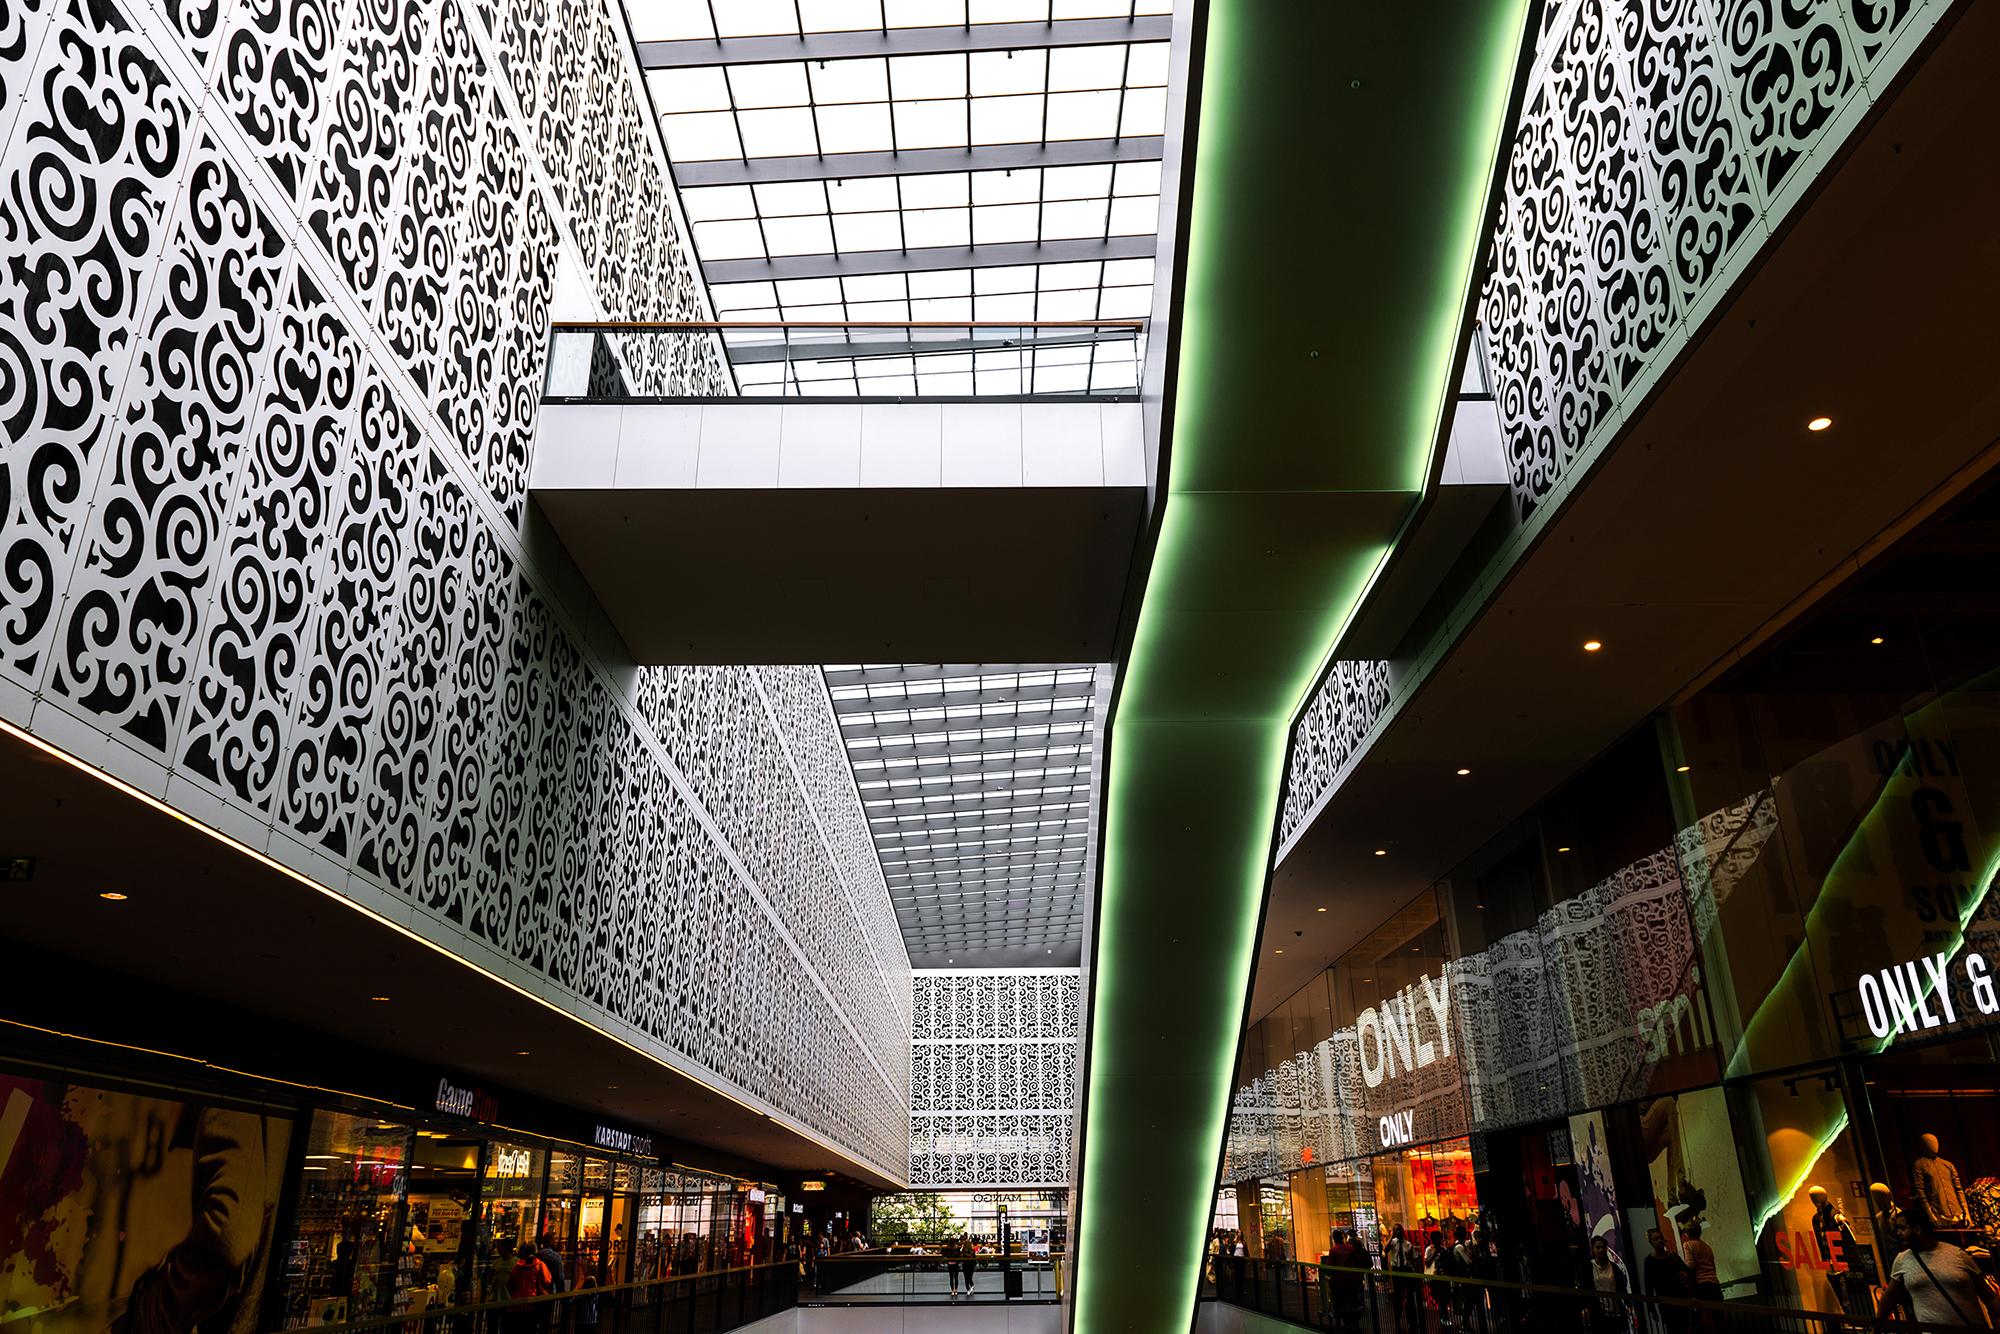 Centrum Galerie shopping mall